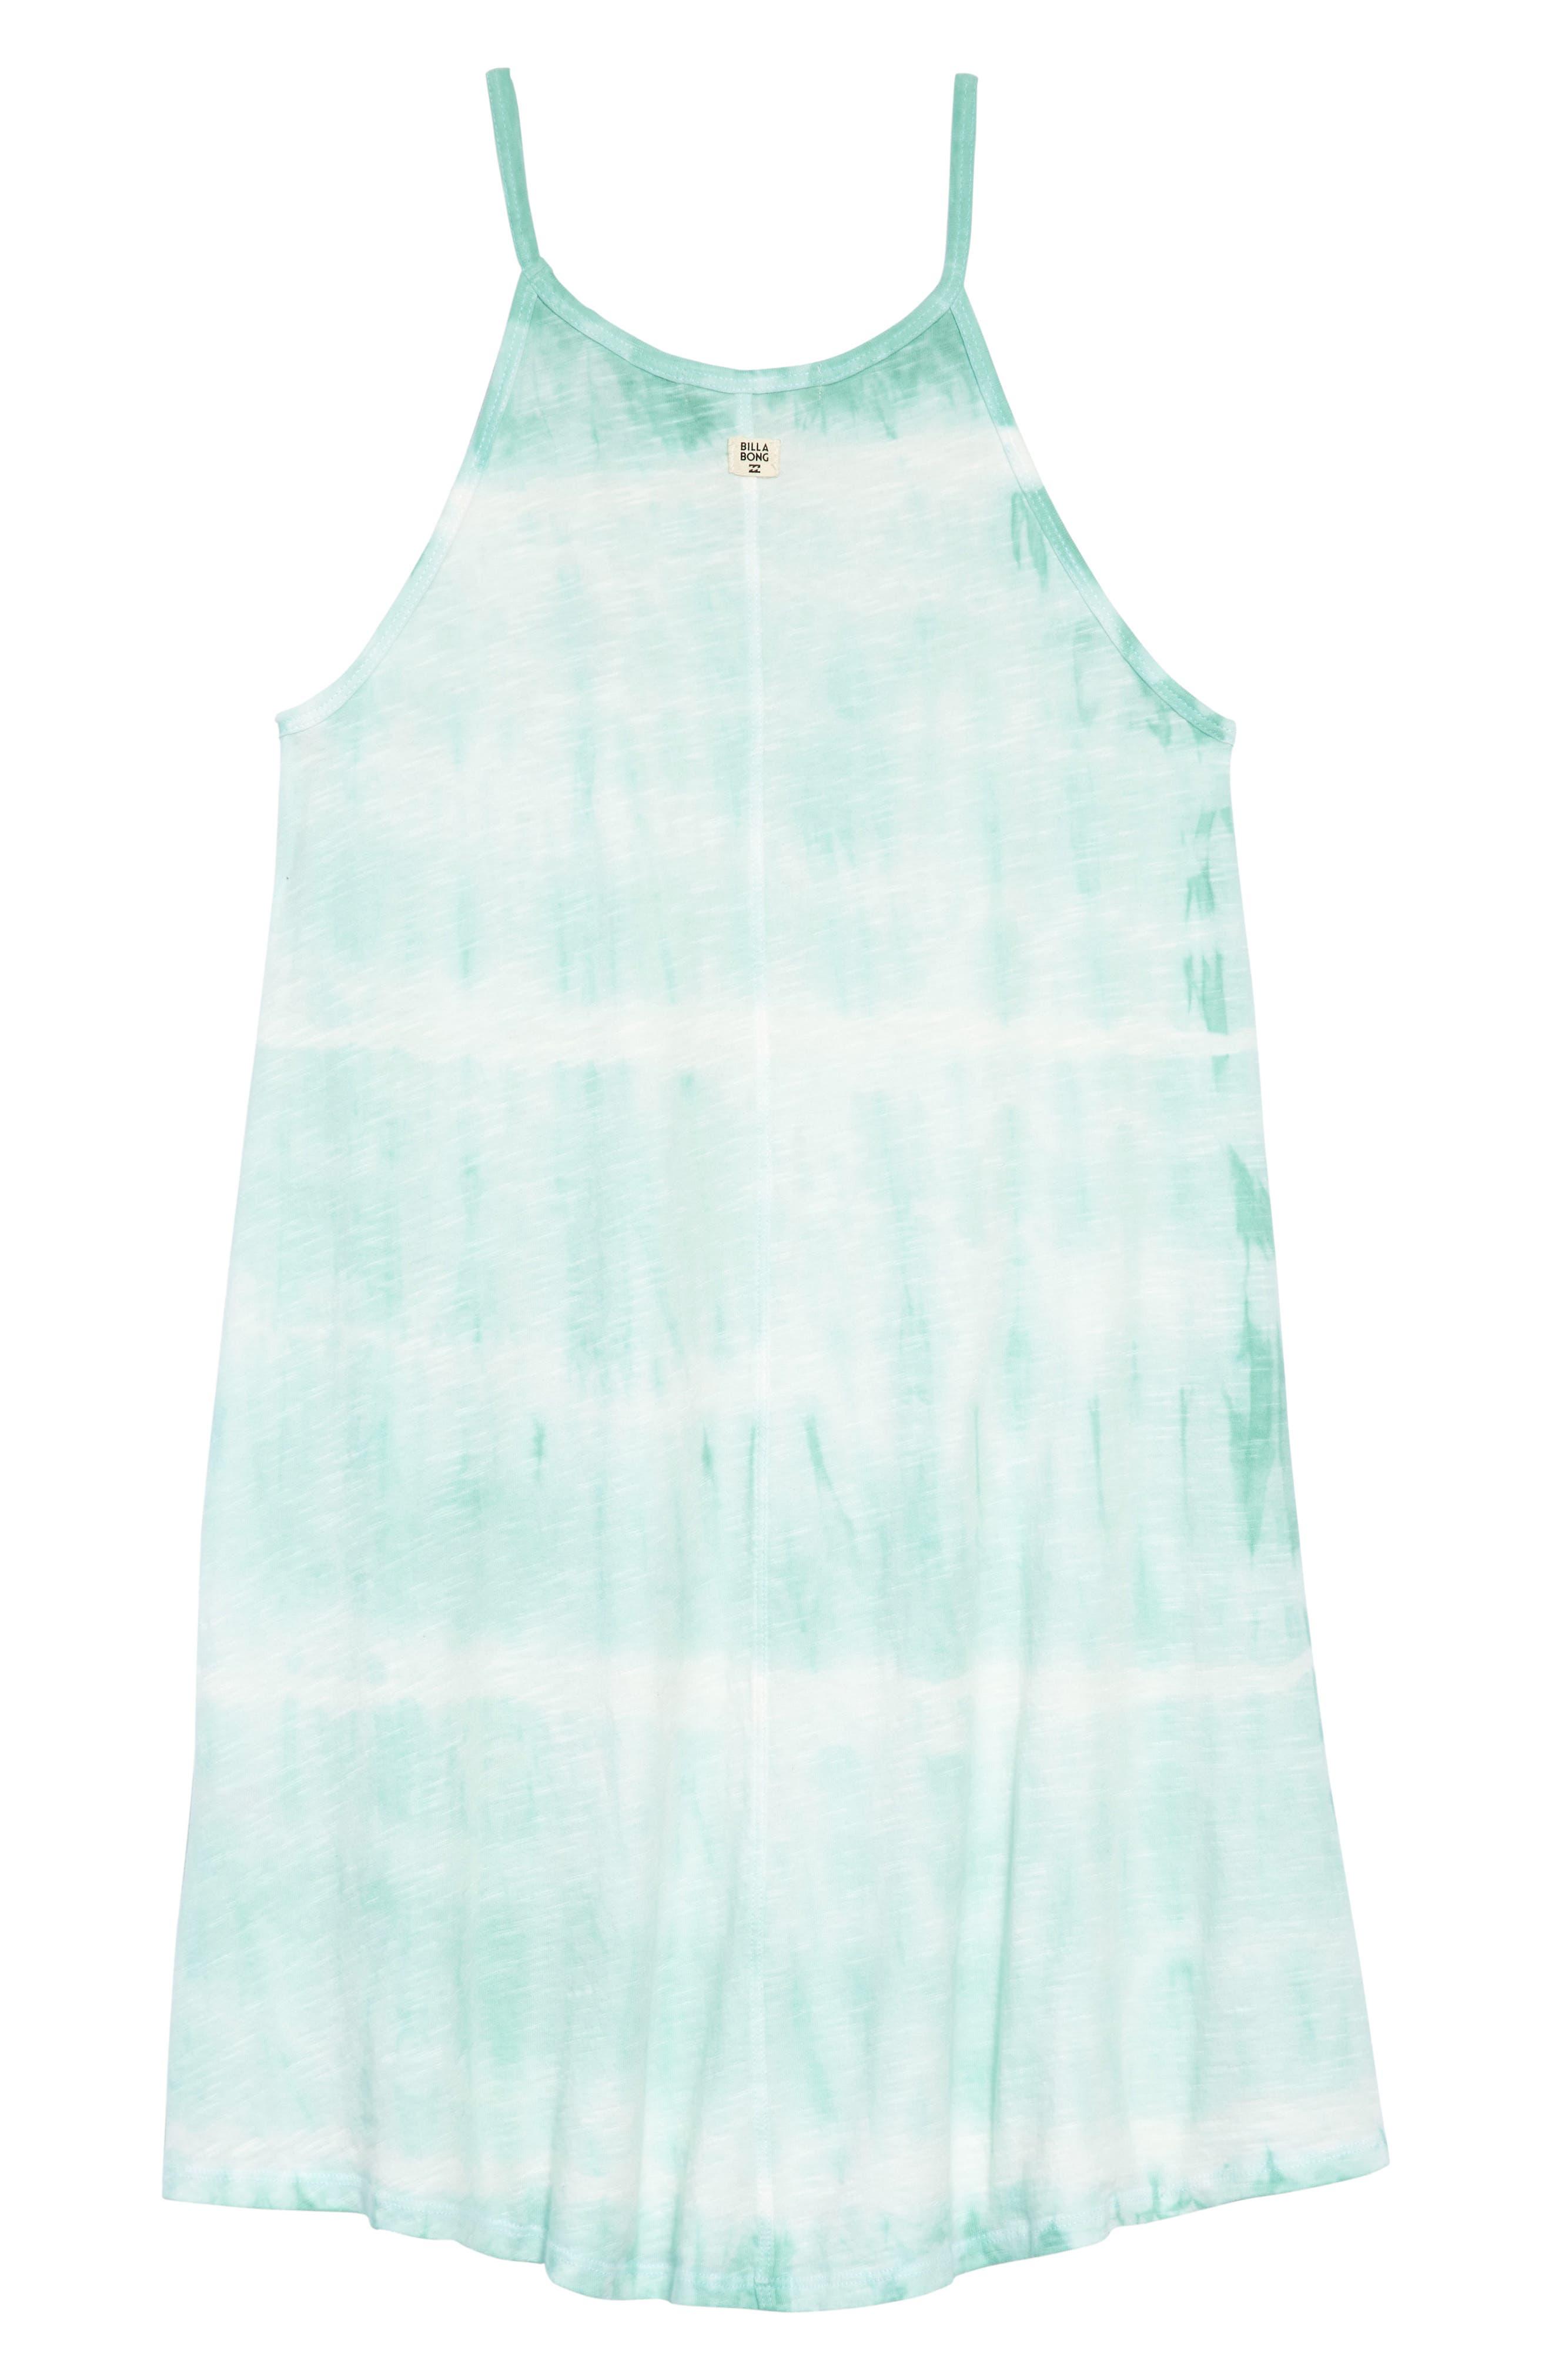 BILLABONG,                             Namaste All Day Tie-Dye Dress,                             Alternate thumbnail 2, color,                             414